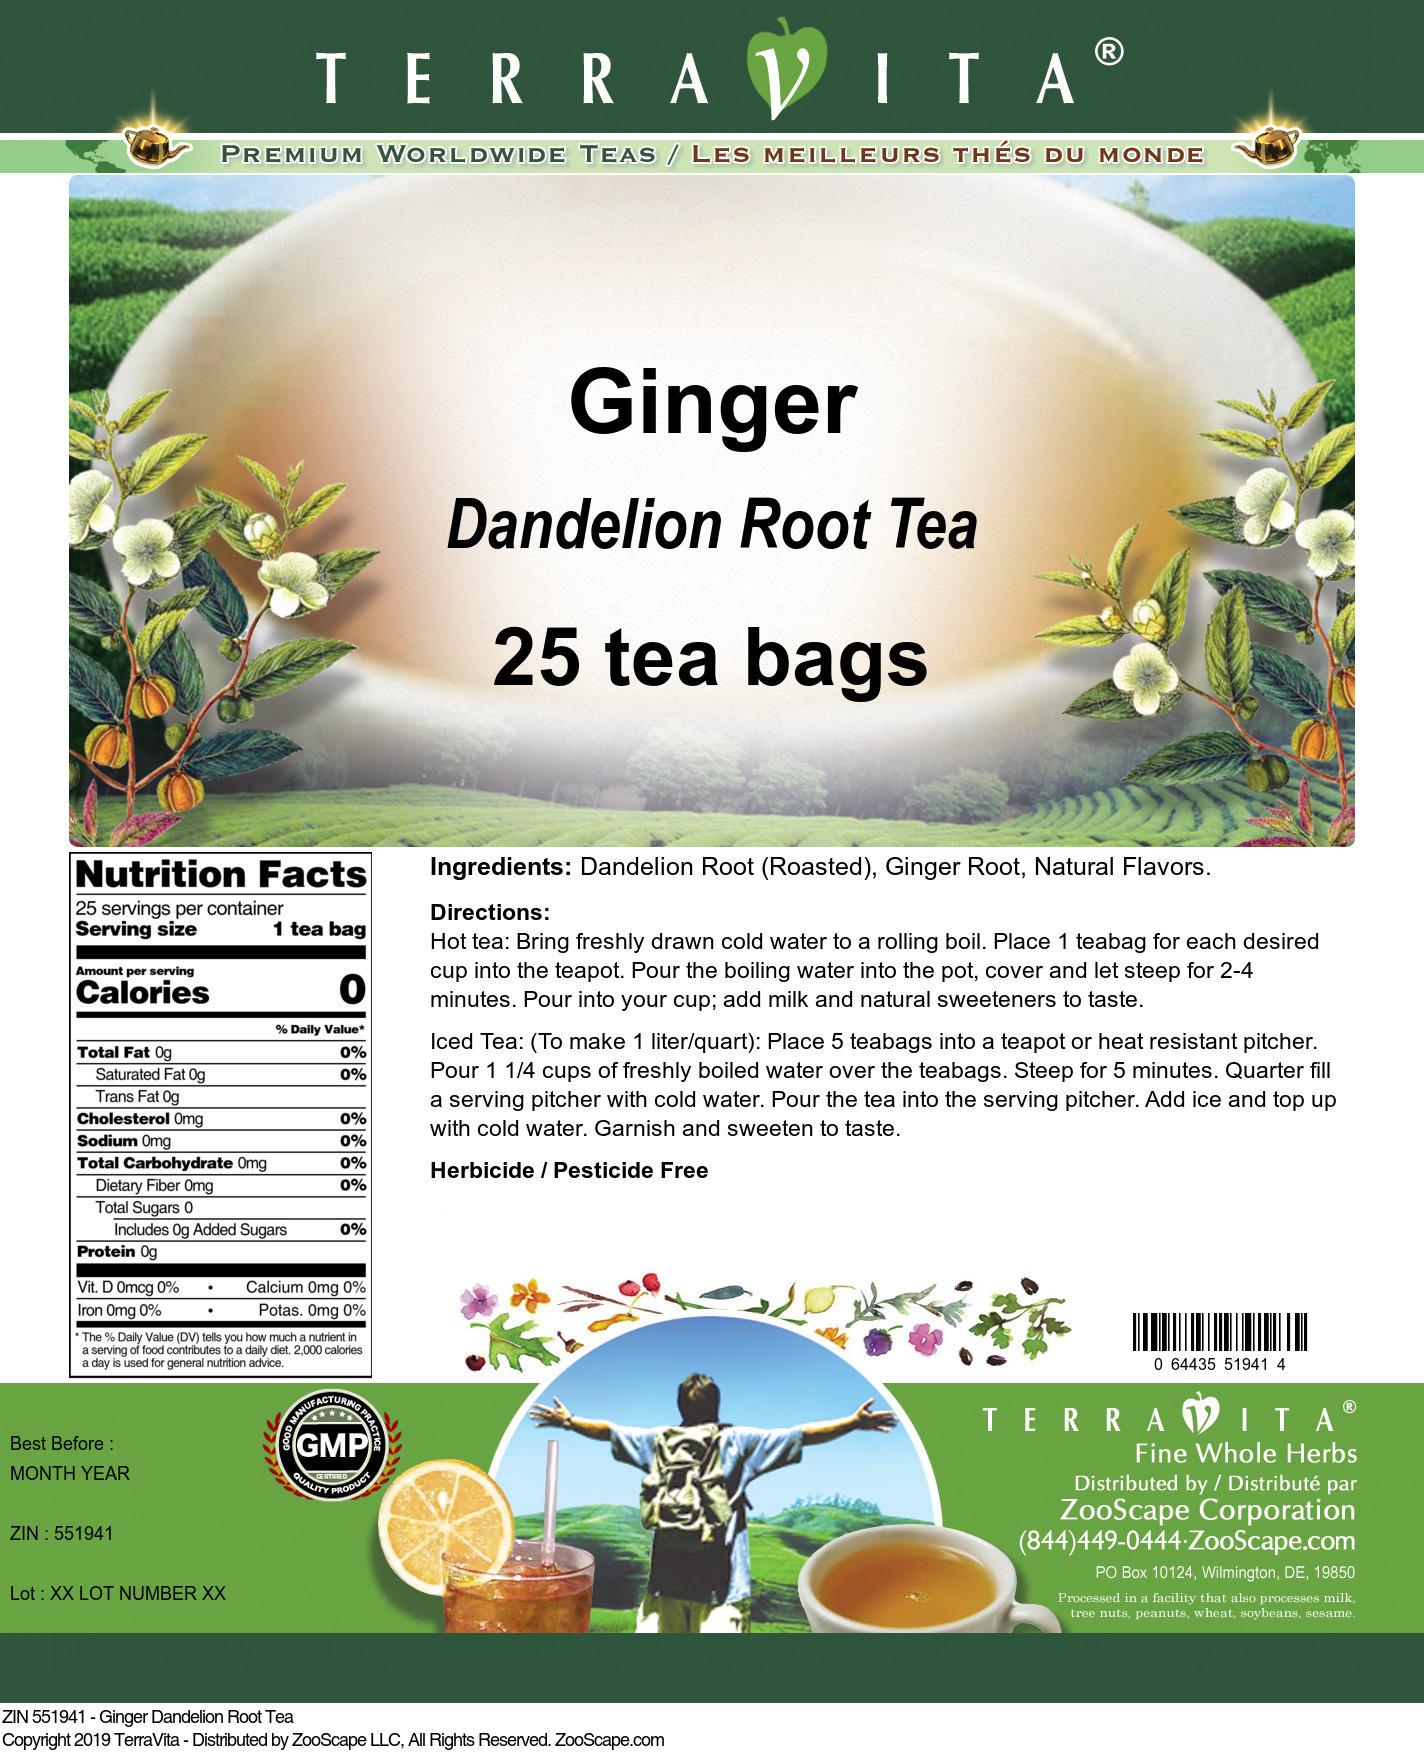 Ginger Dandelion Root Tea